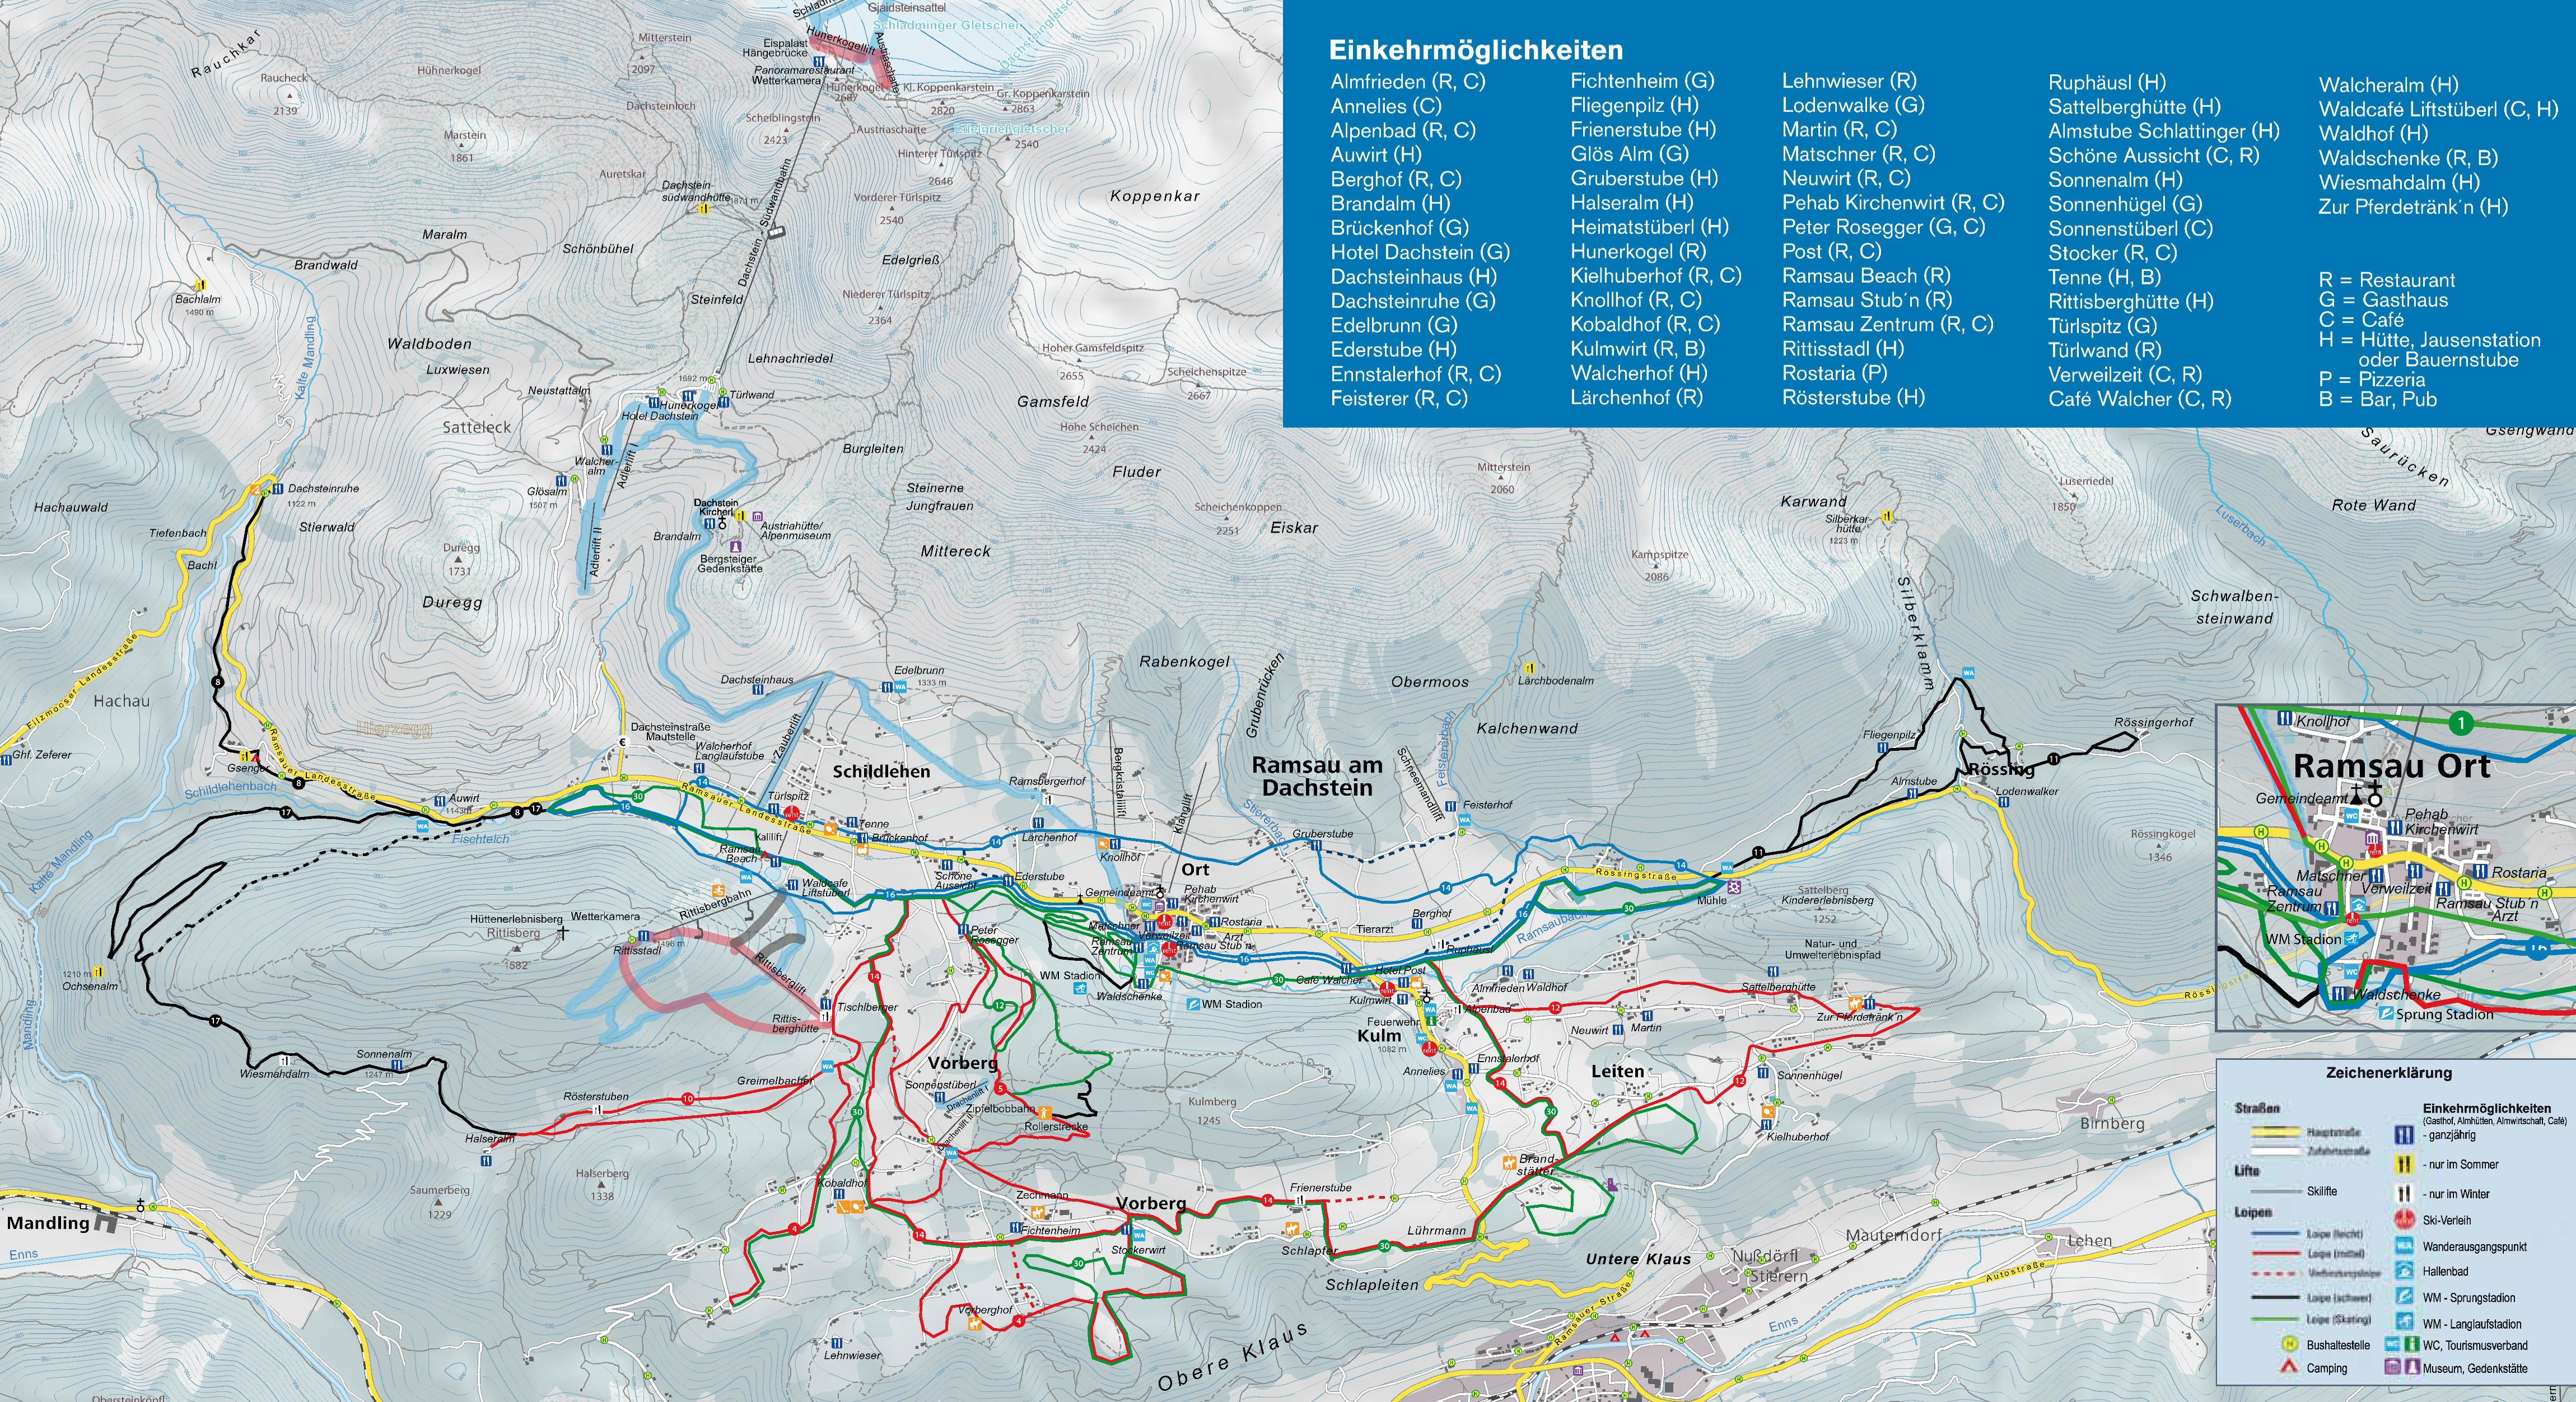 Dachstein Karte.Loipenplan Ramsau Am Dachstein Gespurte Loipen Offene Loipen